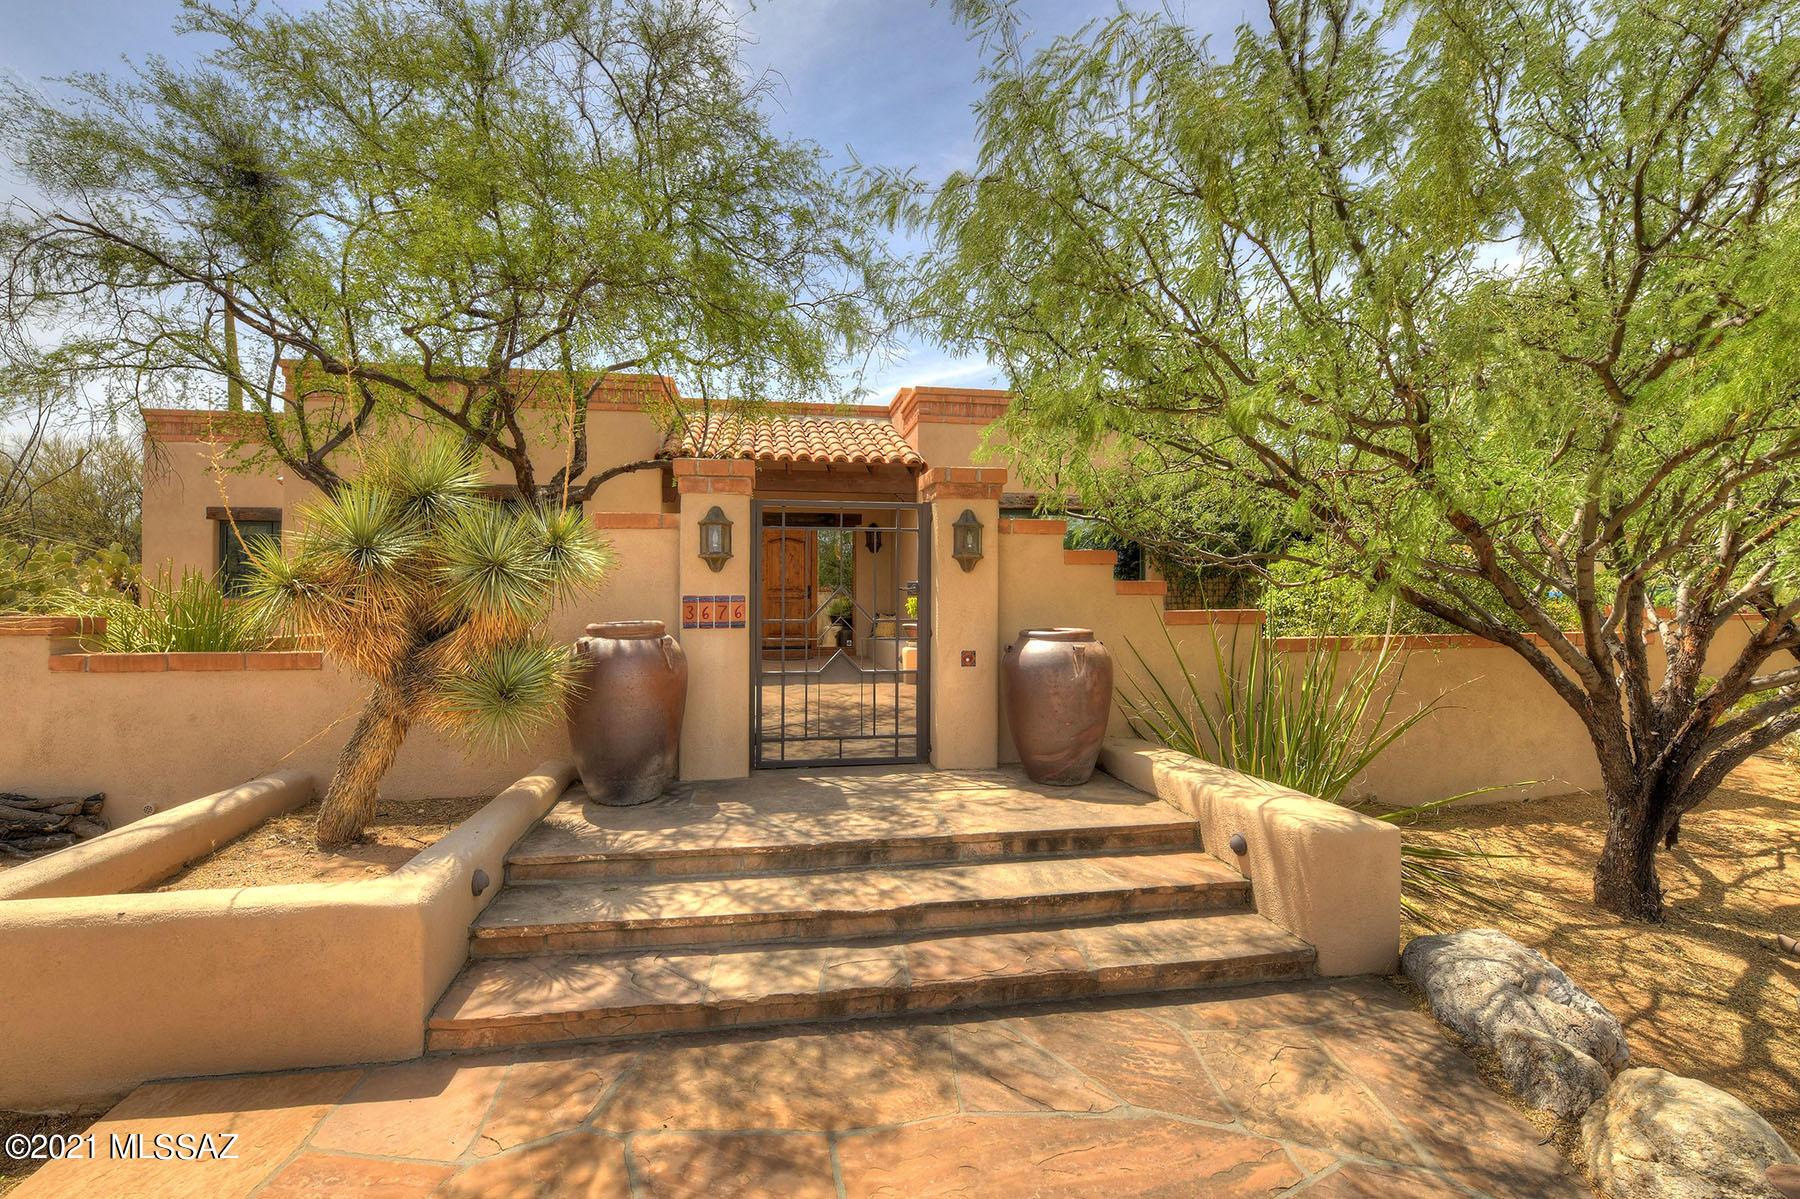 Photo of 3676 N Camino Ojo De Agua, Tucson, AZ 85749